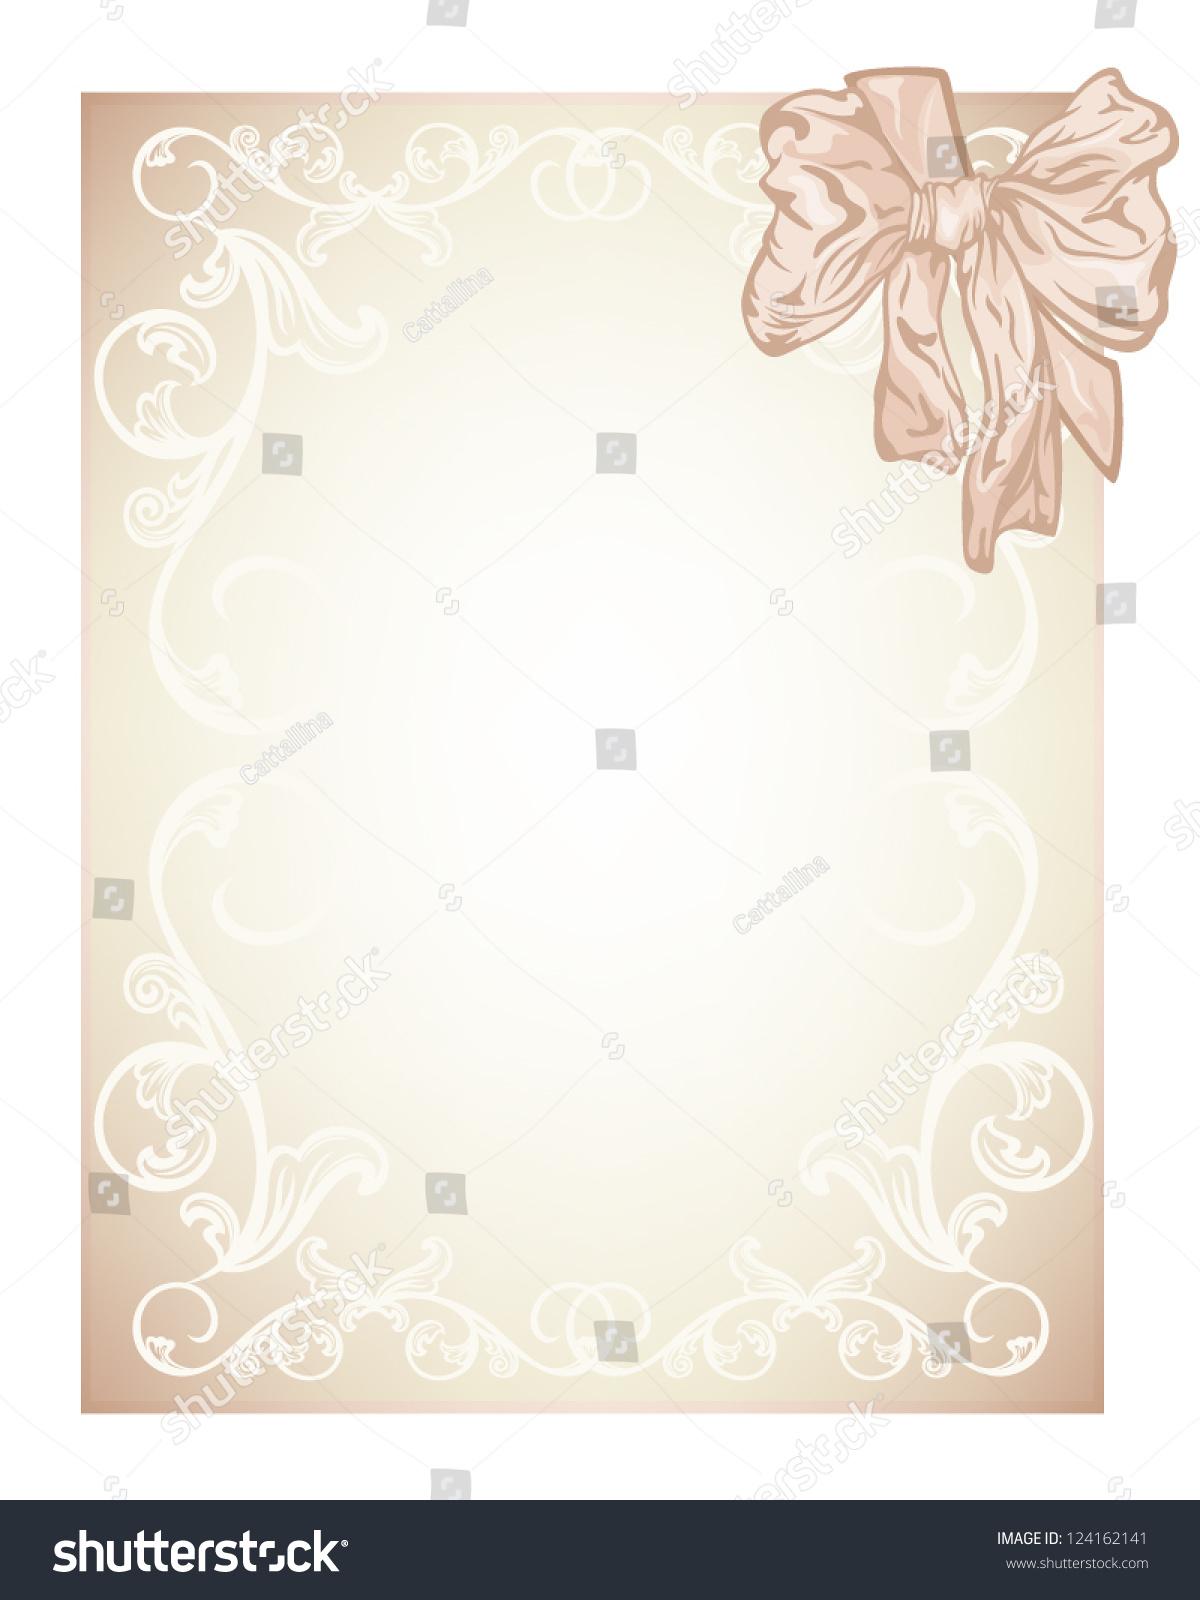 blank wedding invitation card design - 28 images - wedding card ...